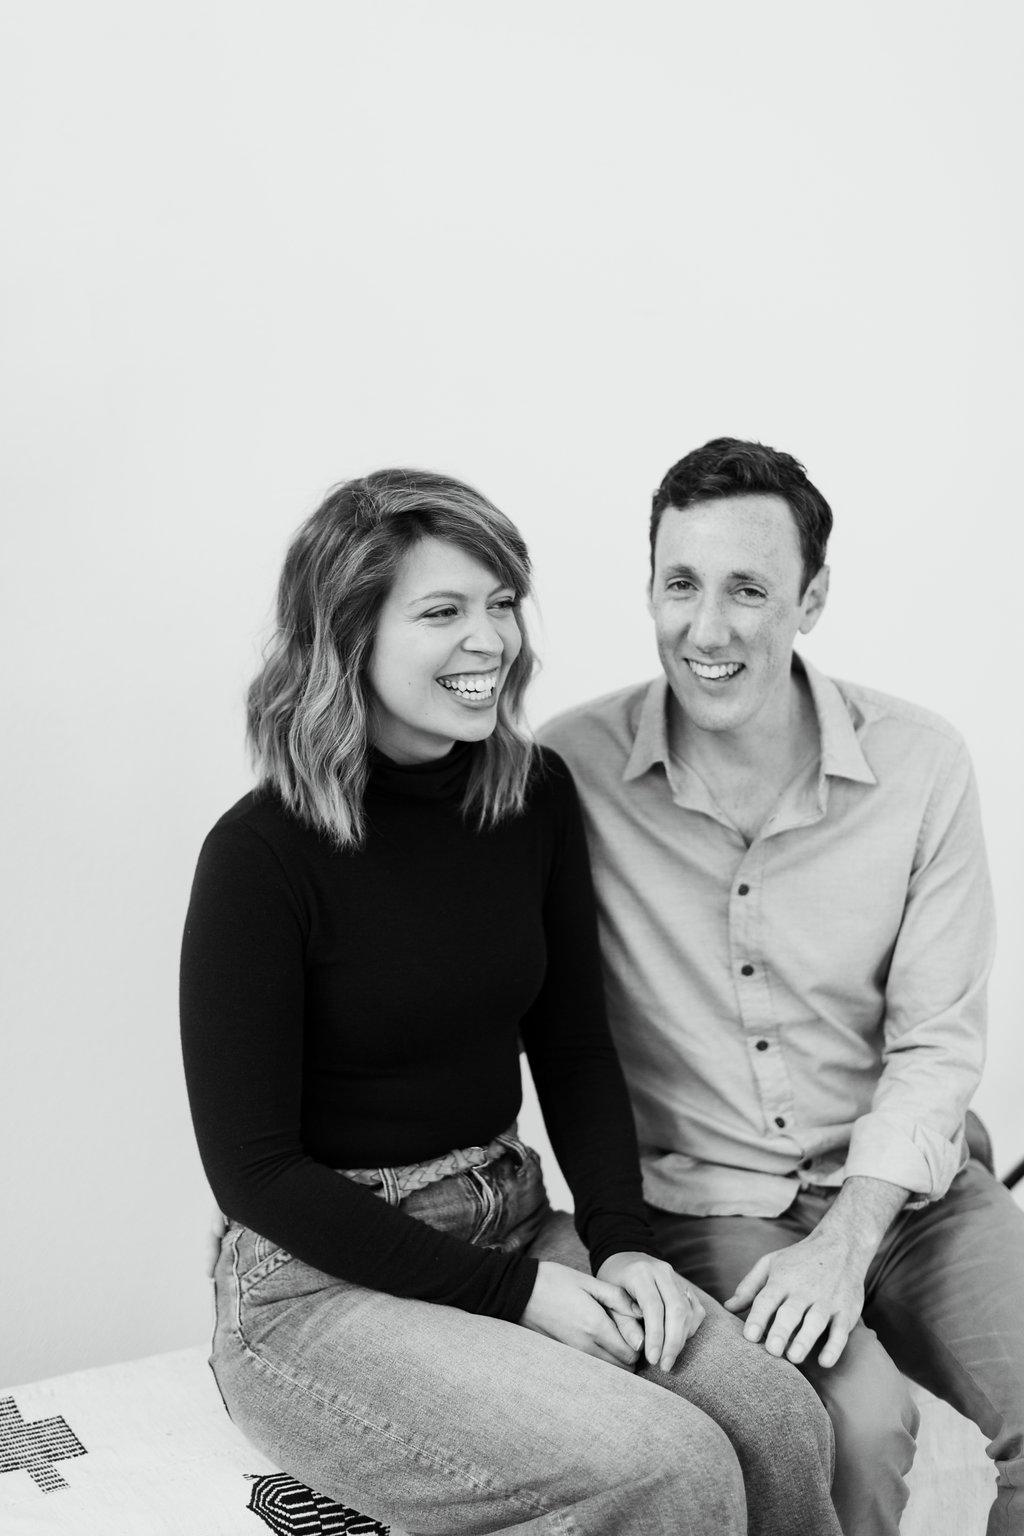 Paige-Newton-Photography-Couple-Studio-Session-Austin-Engagement-Session0004.jpg